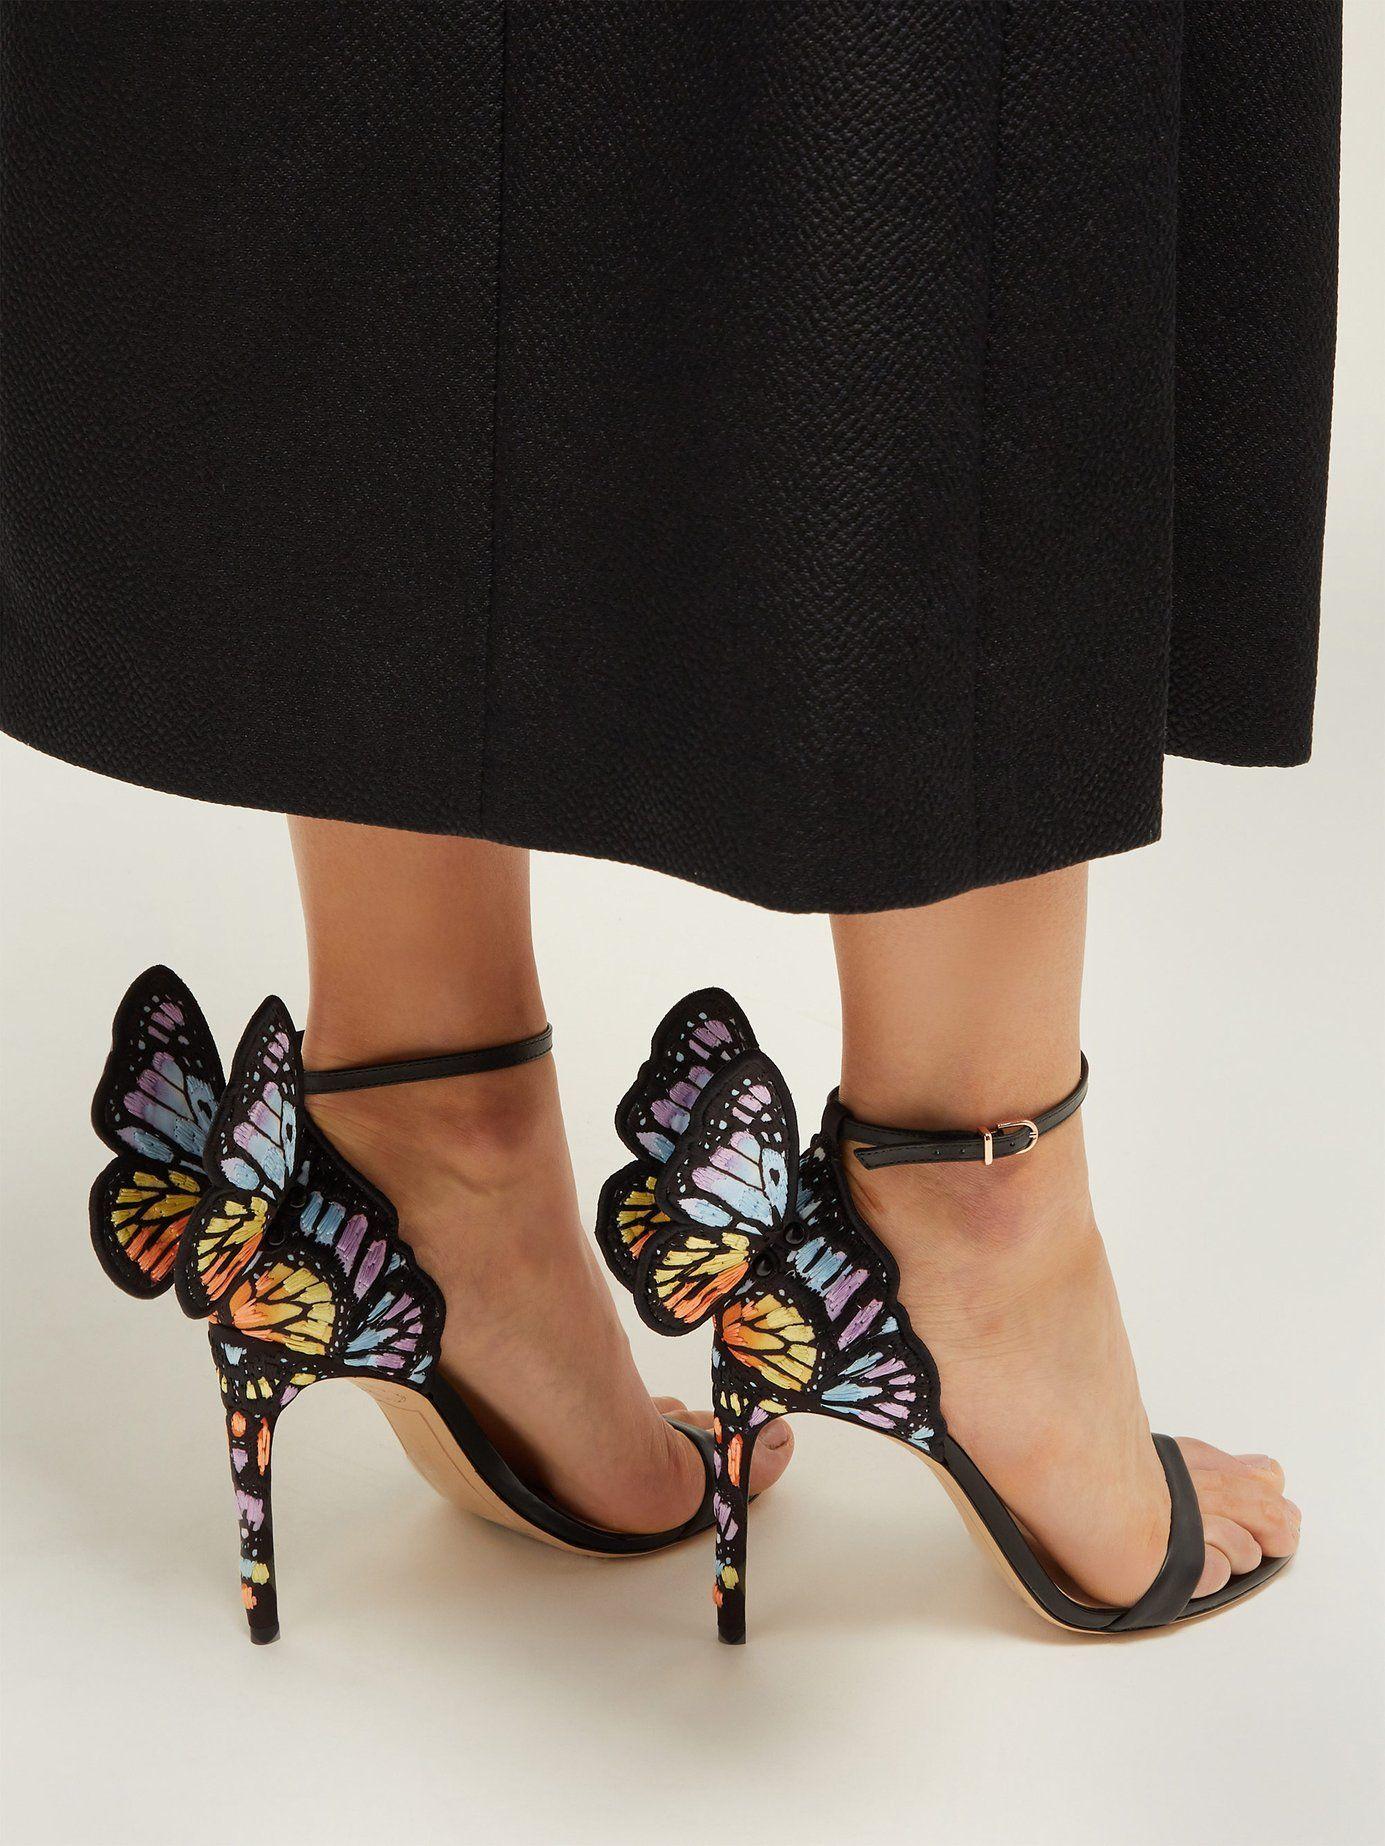 5b3c752b8f06 Chiara butterfly-wing leather stiletto sandals